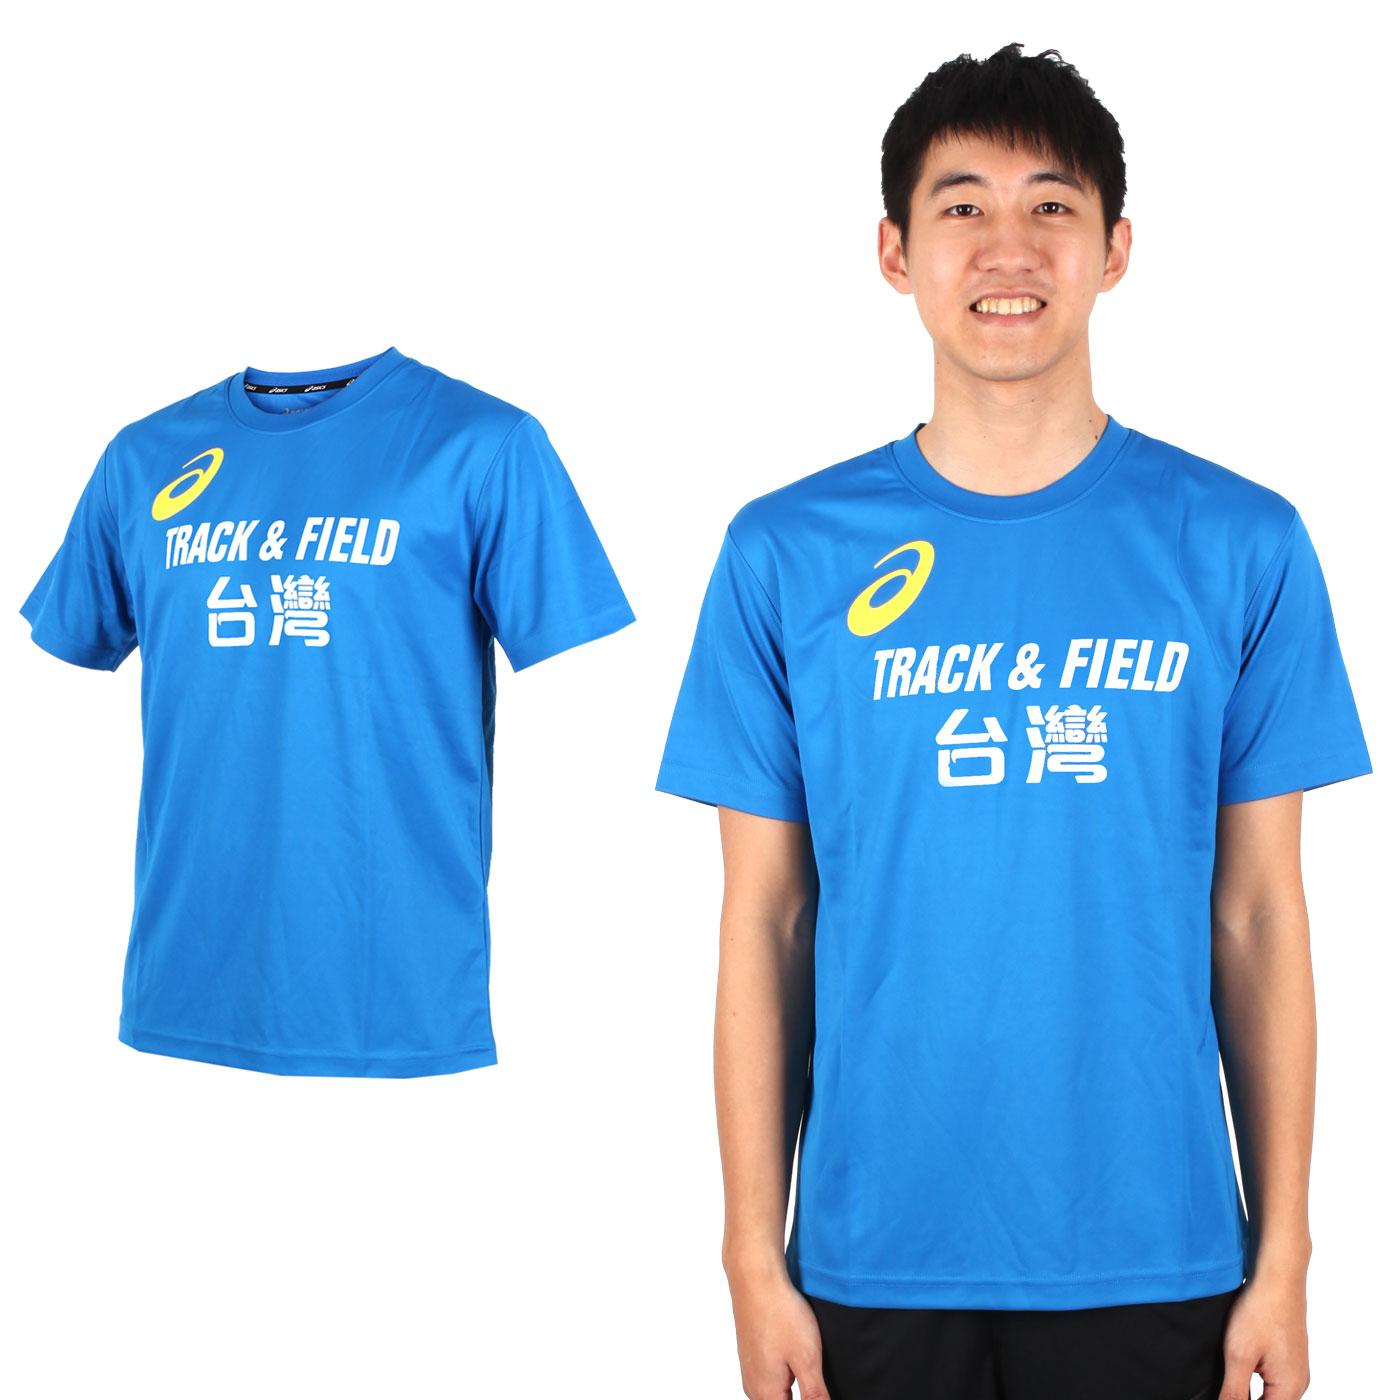 ASICS  LOGO 台灣TRACK AND FIELD獨家款K11613-43TAF - 藍黃